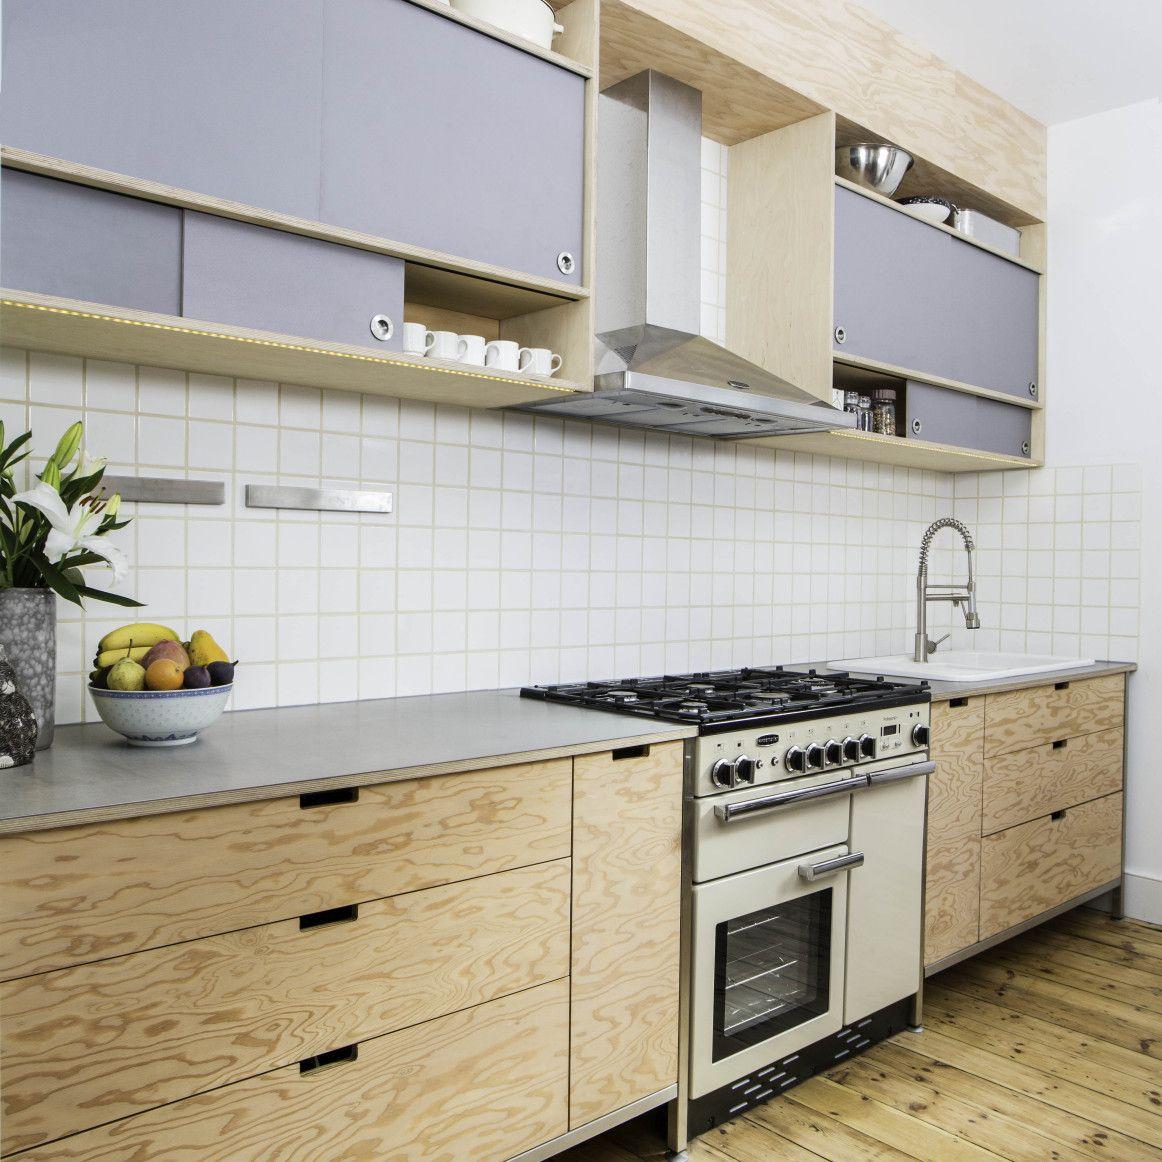 Image result for douglas fir plywood | 1603048 - C+T | Pinterest ...